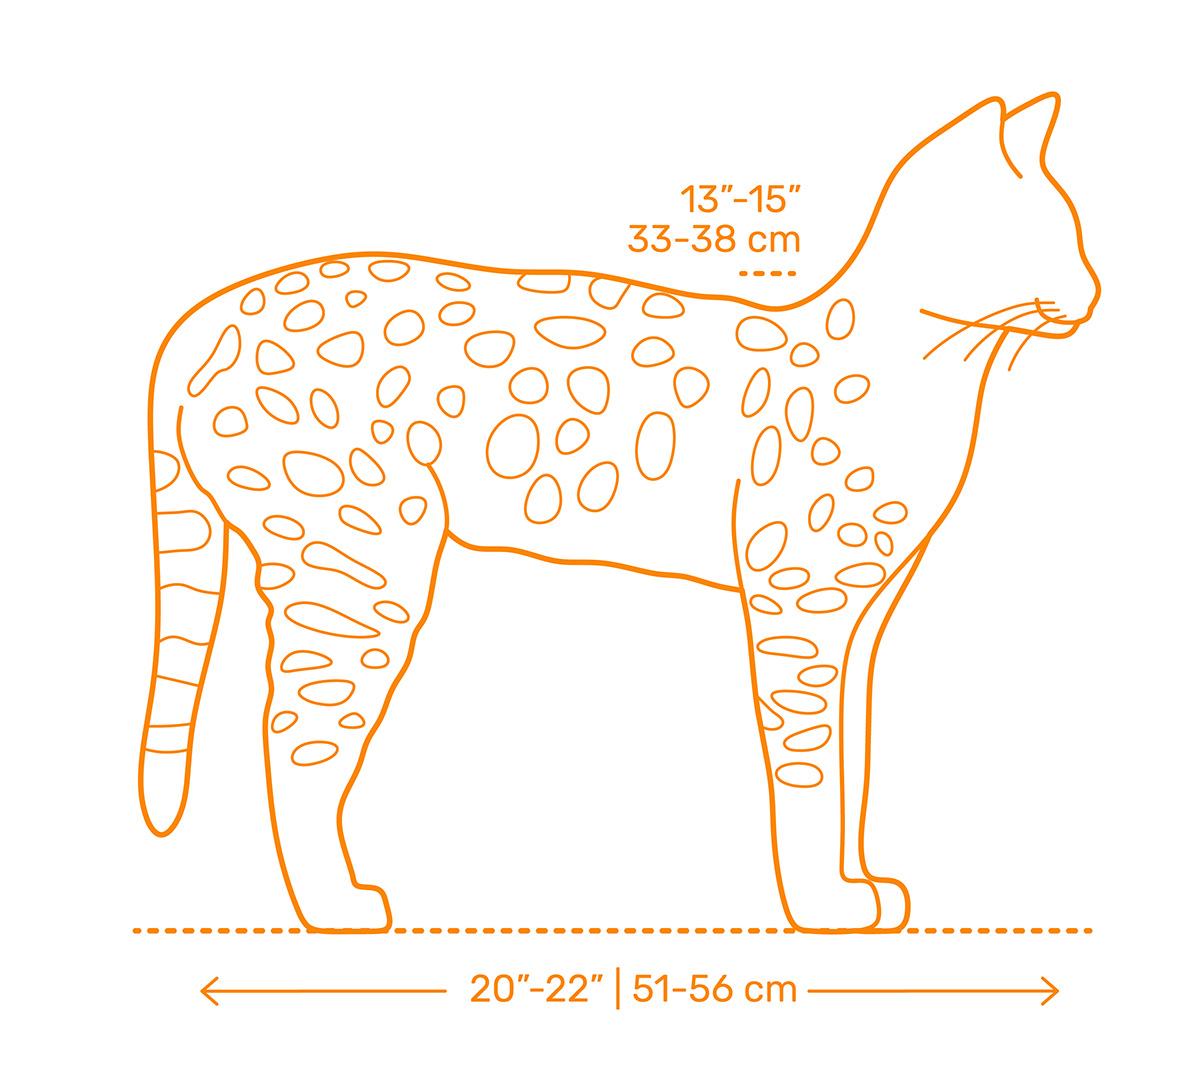 Savannah Cat Size